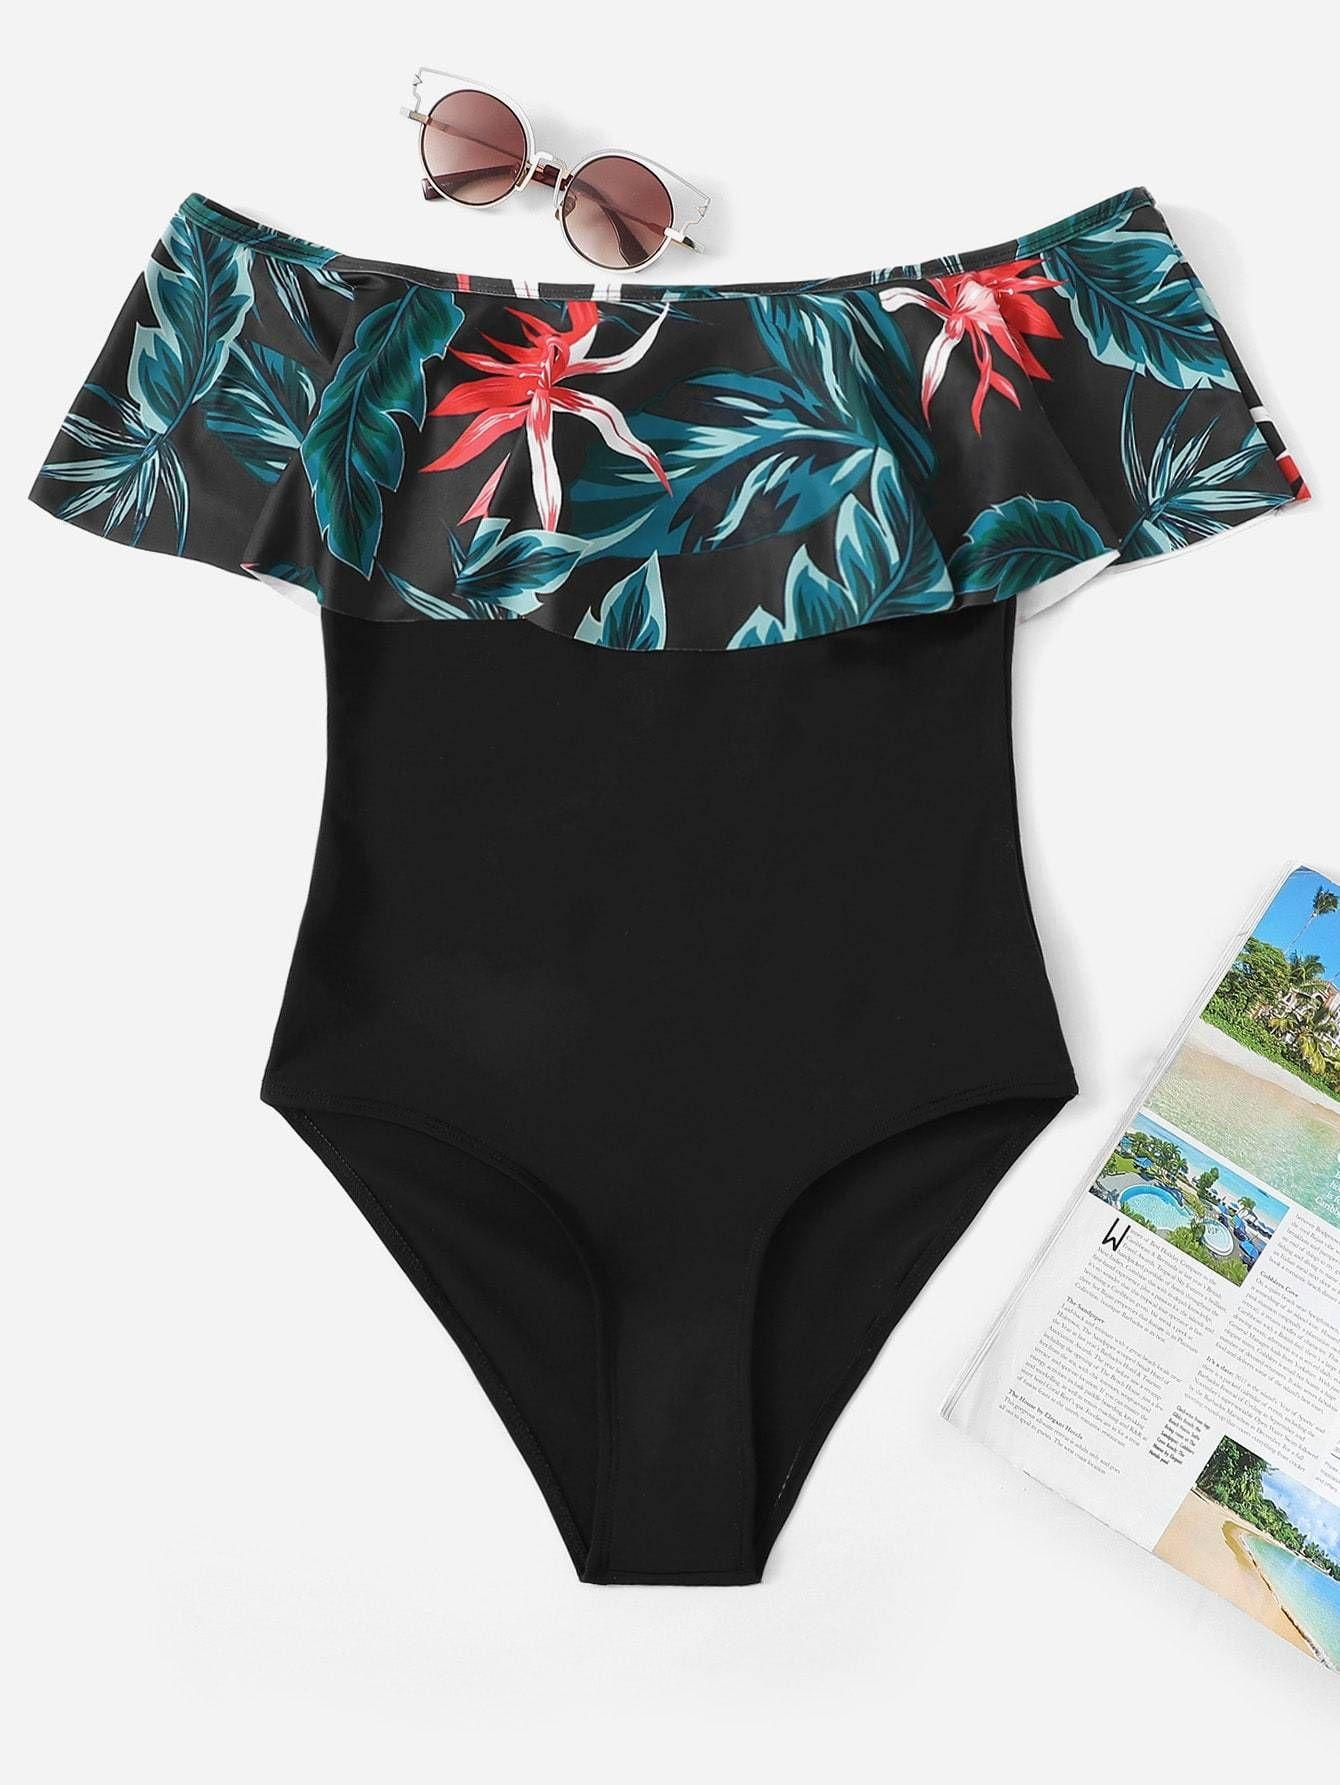 ce7866f181 random tropical flounce bardot one piece swimsuit. #swimwear #beachwear  #women #fashion